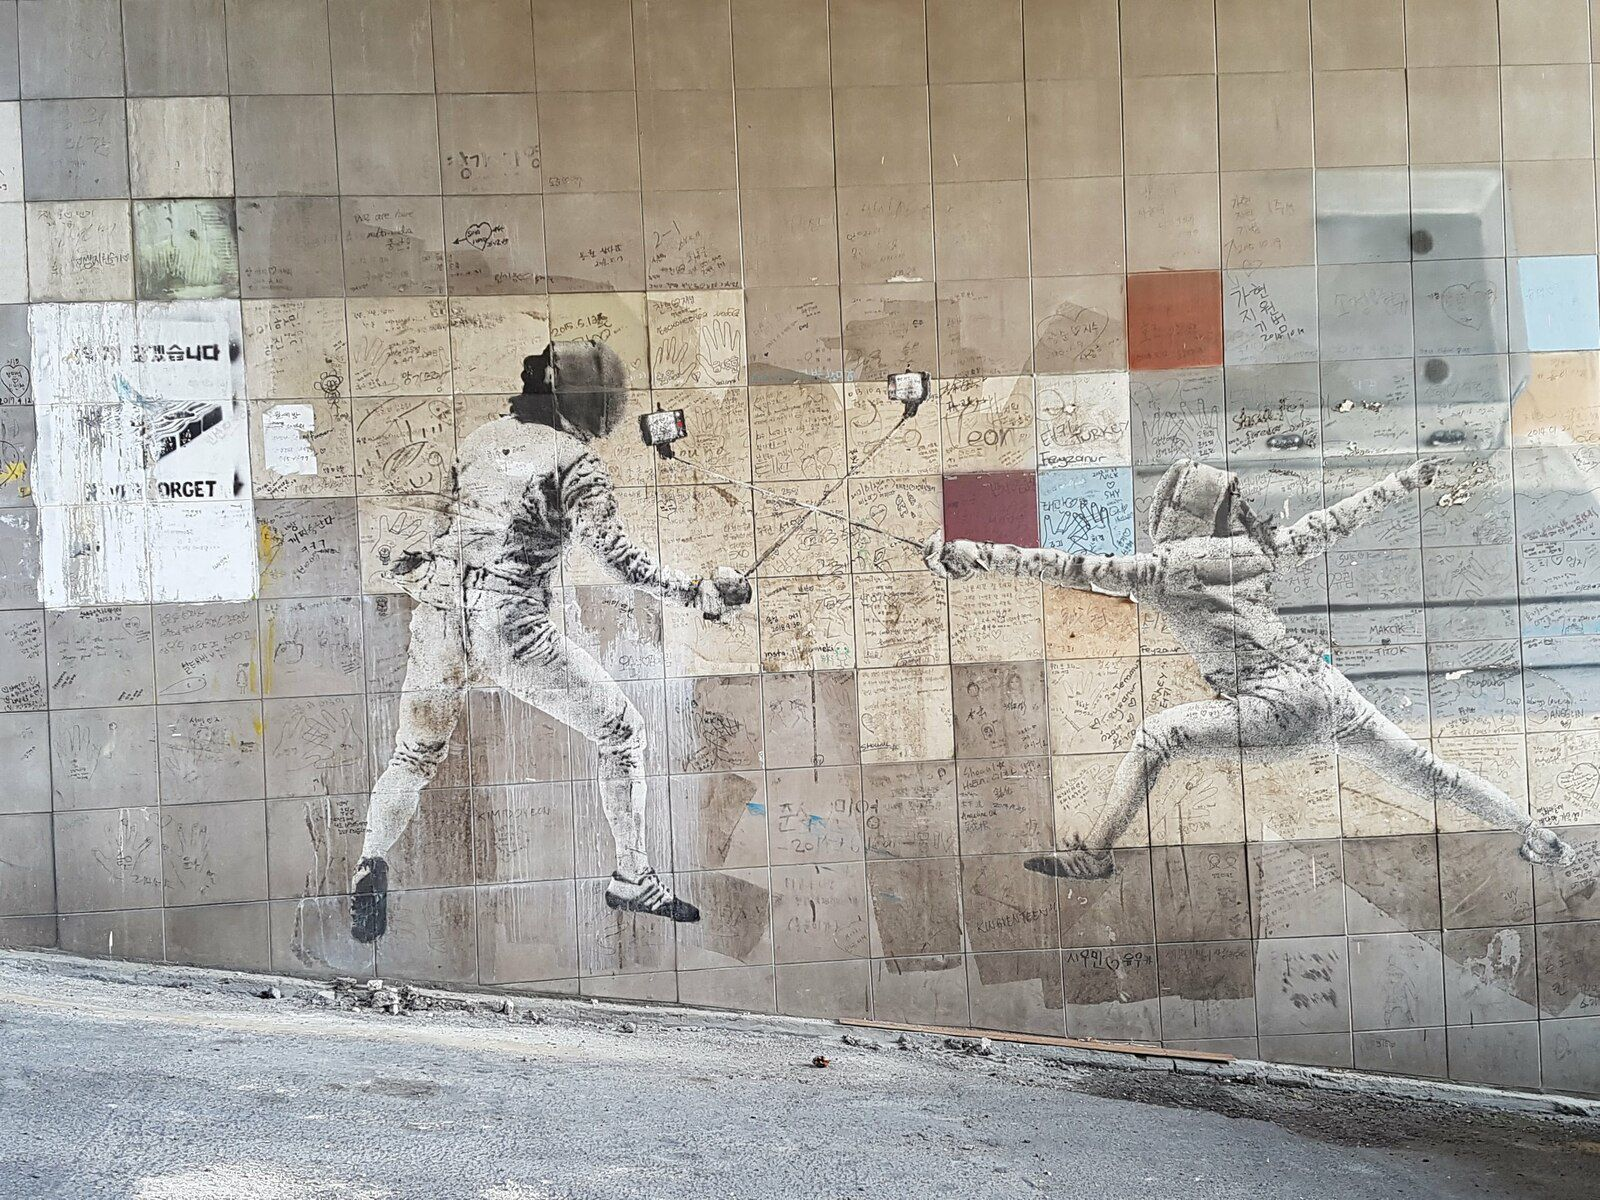 street art, corée du sud, corée, korea, seoul, ihwa mural village, fresques murales, art